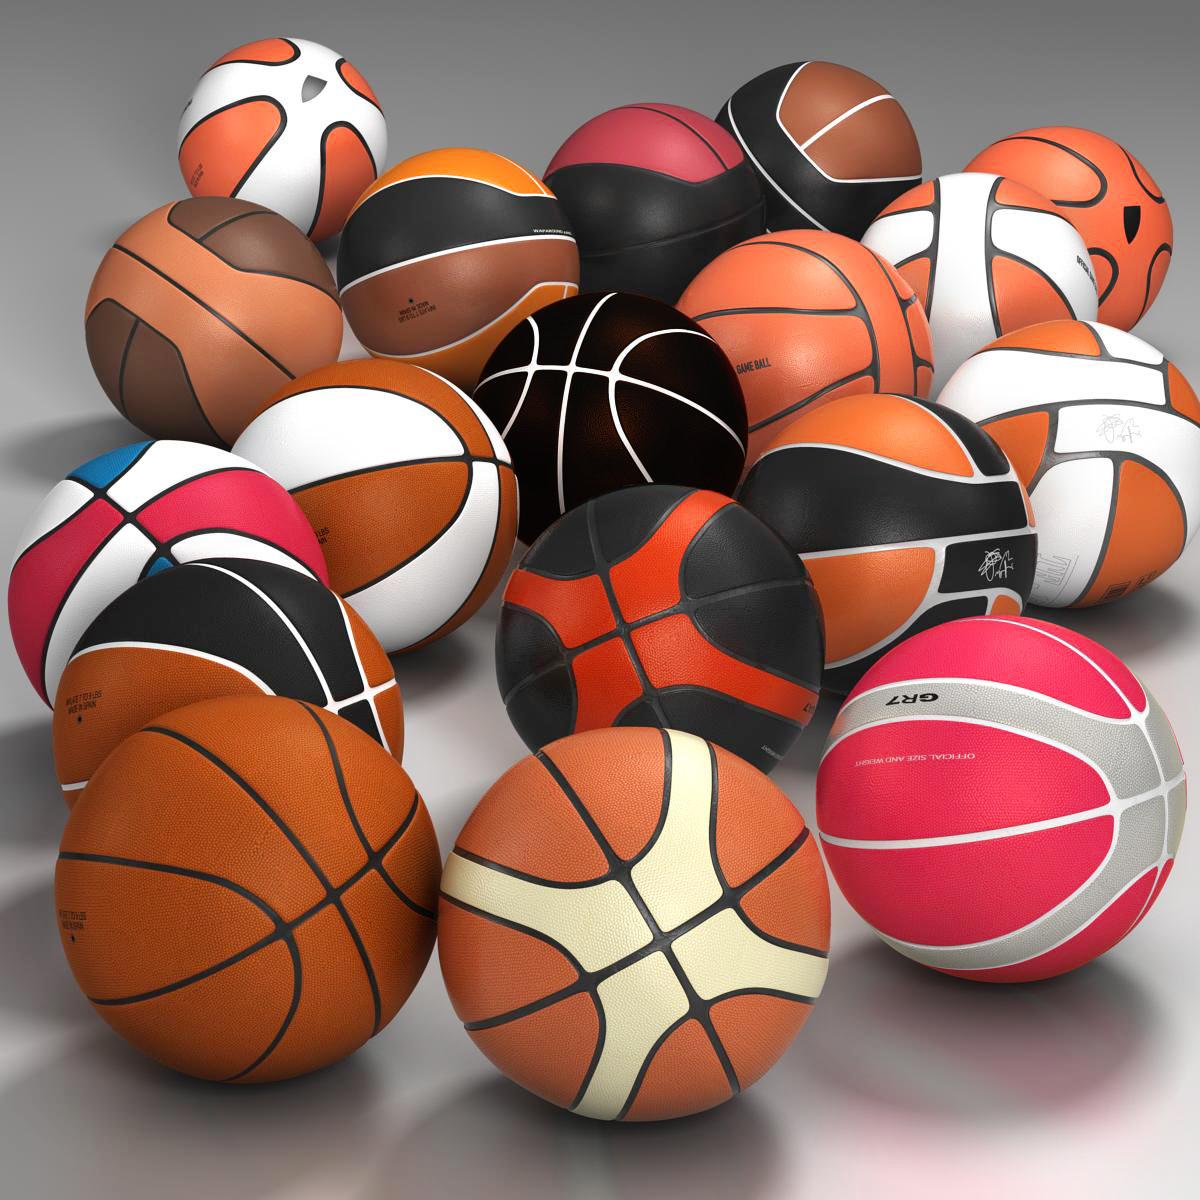 basketbola bumbu komplekts 3d modelis 3ds max fbx c4d ma mb obj 165932